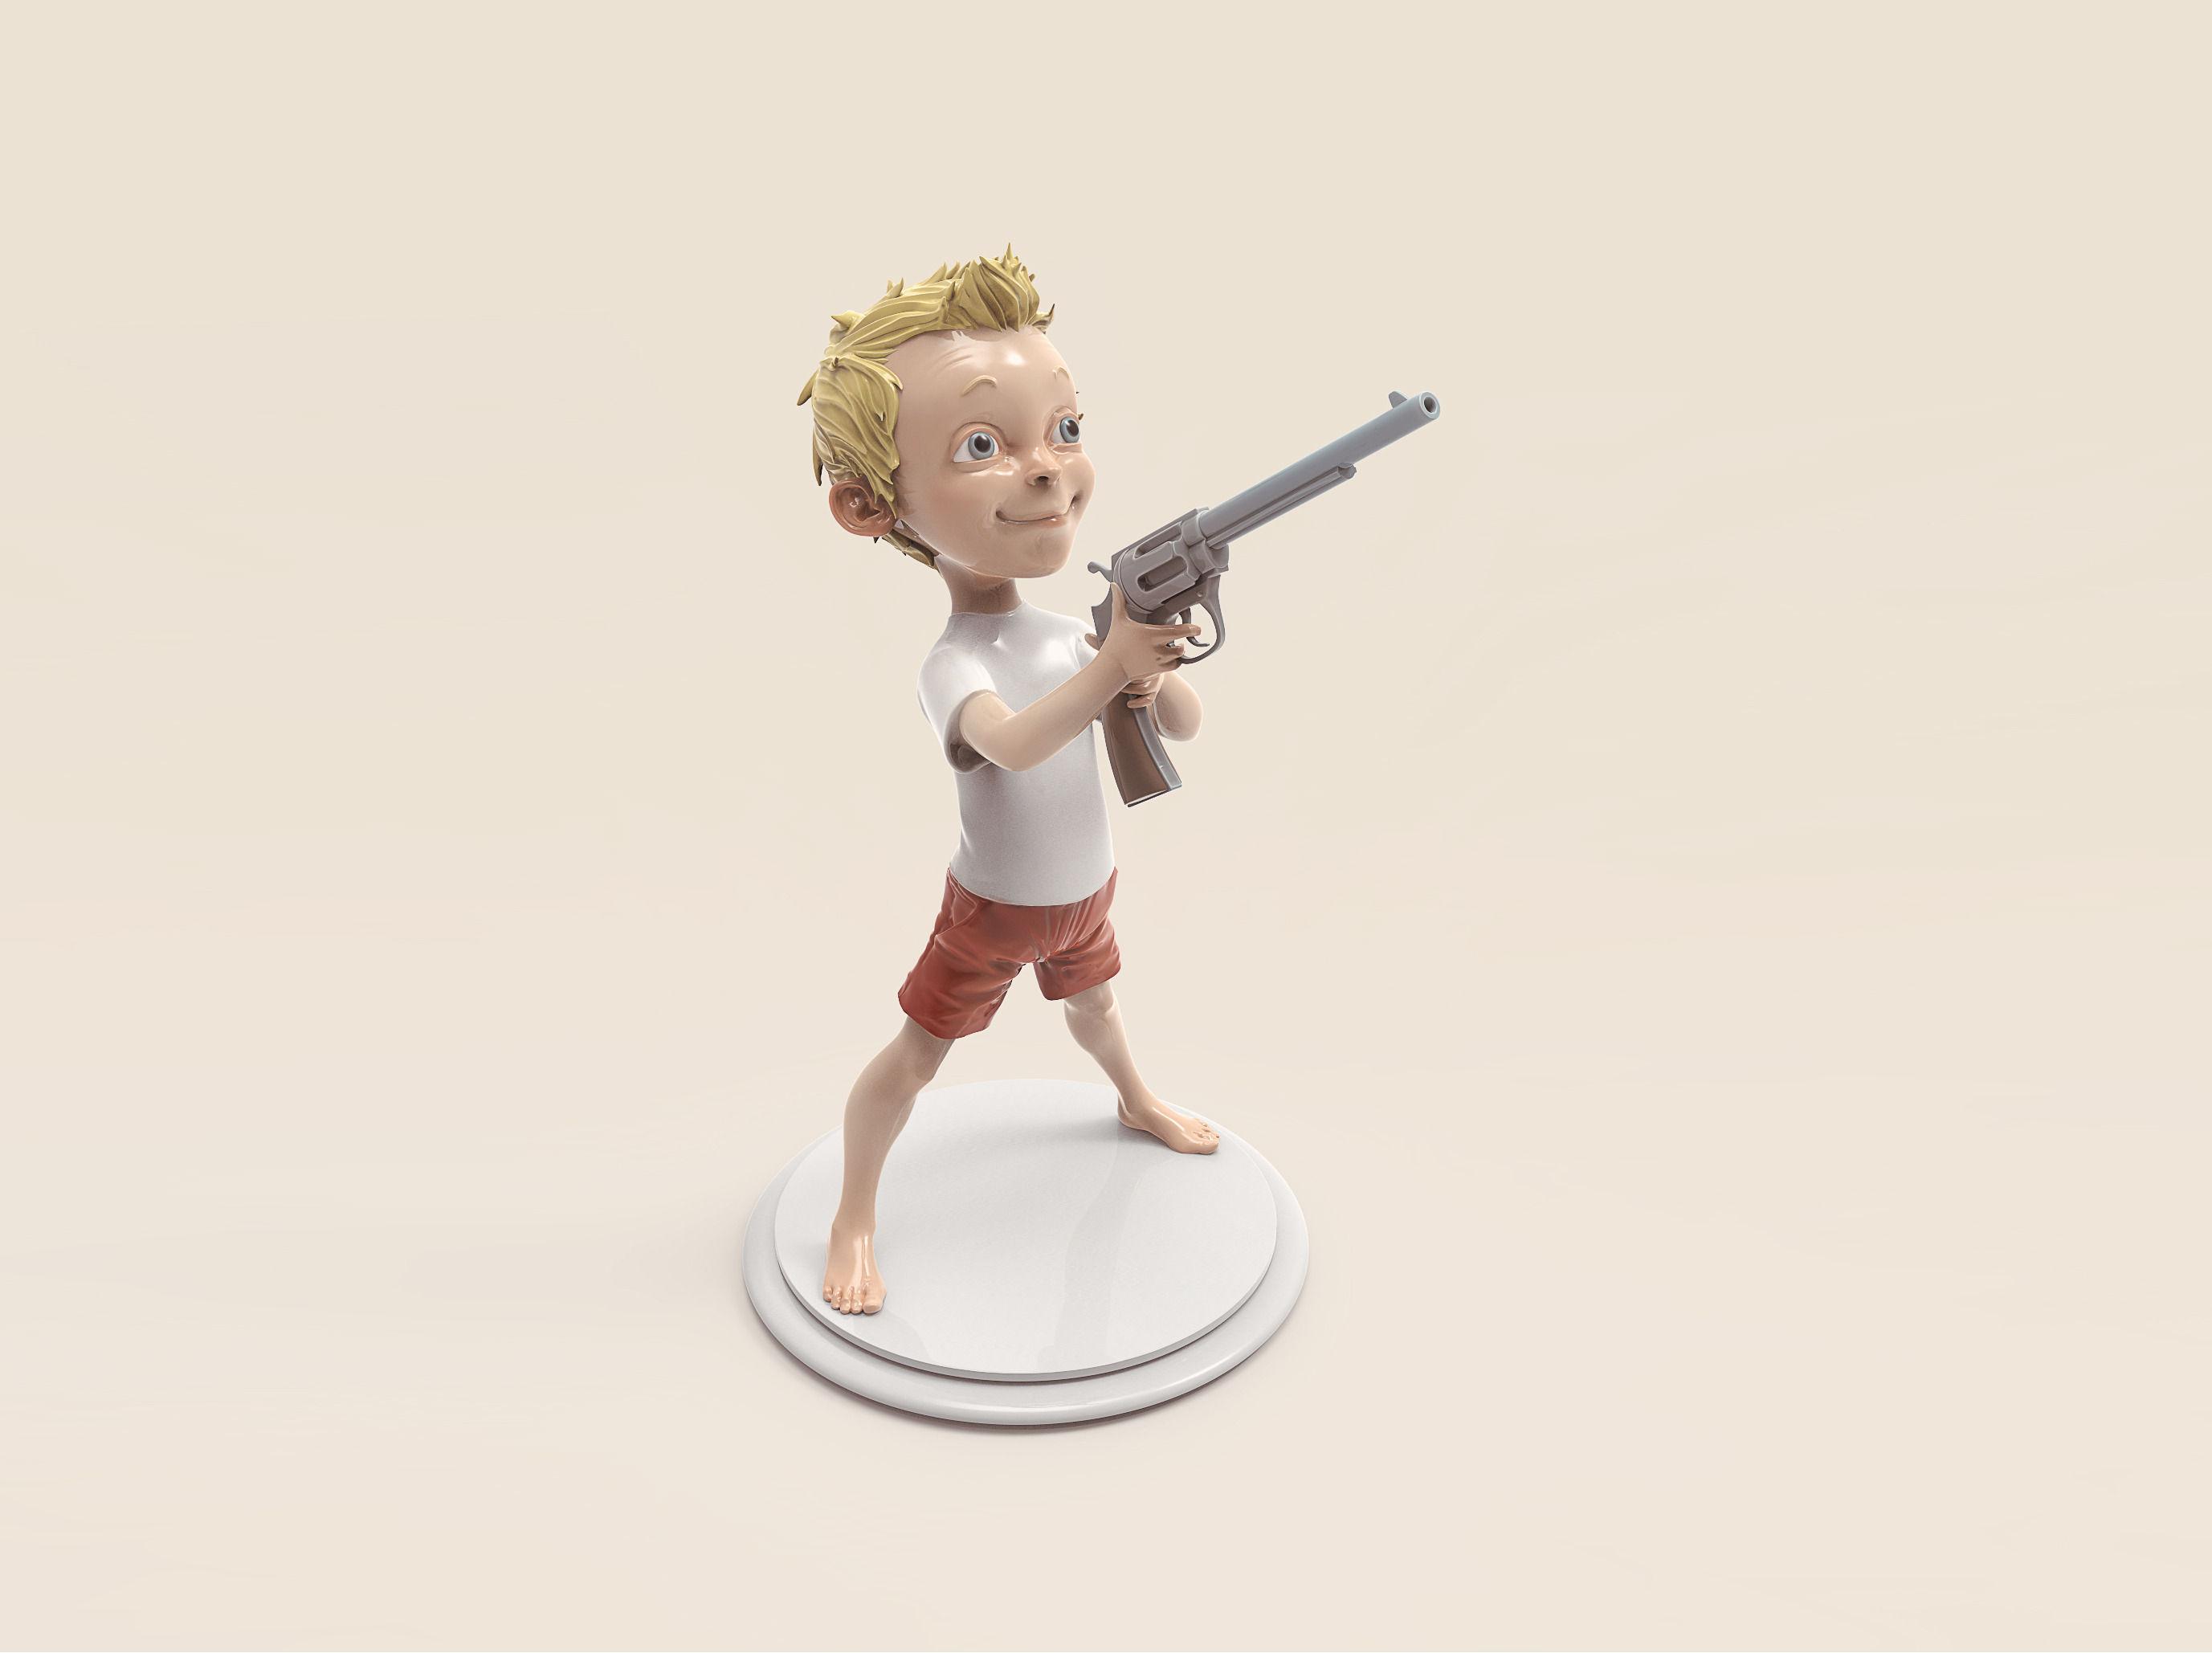 Boy with the gun